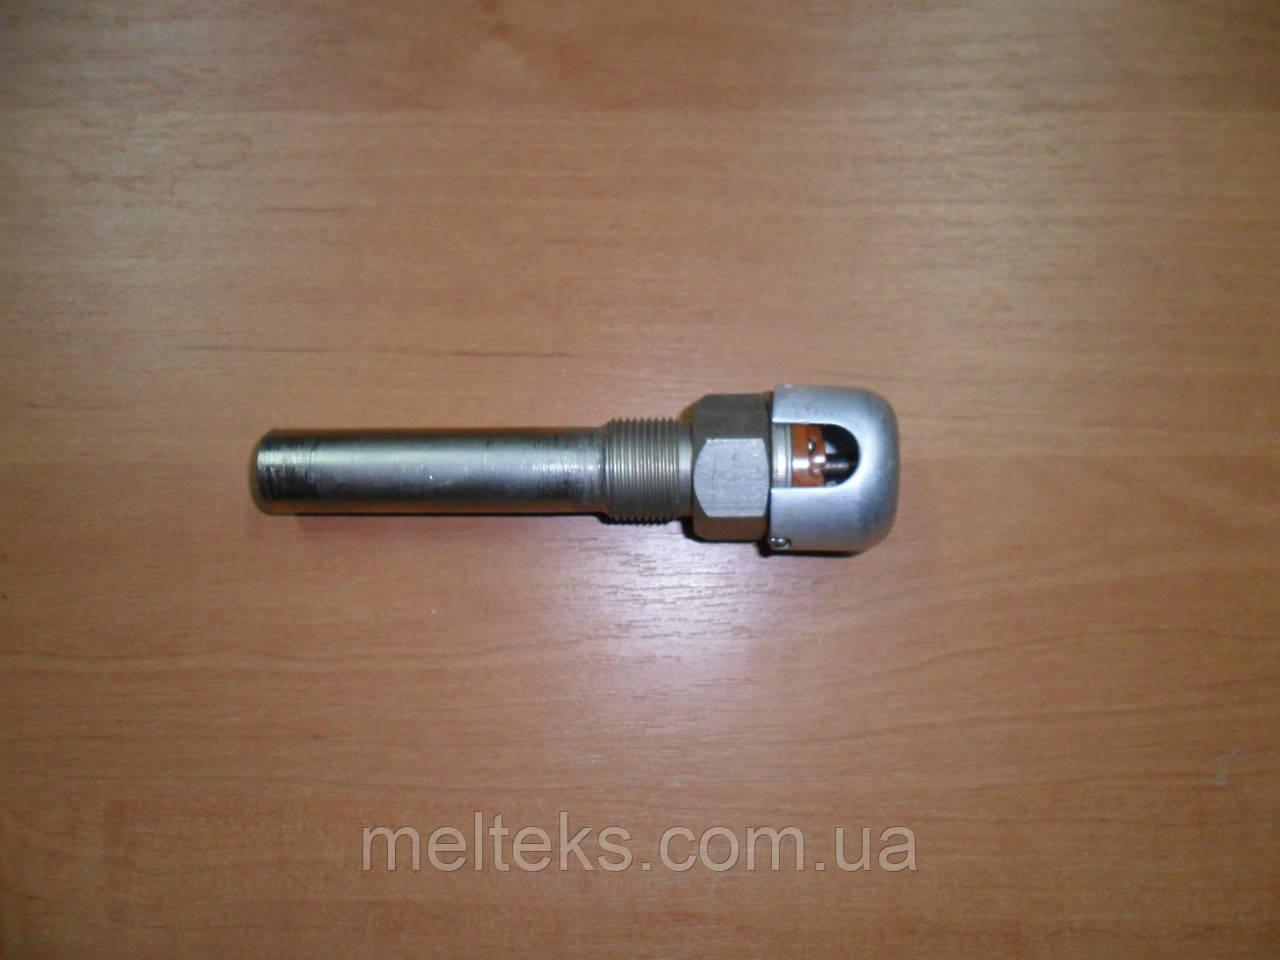 Терморегулятор ТР-200 УХЛ4 ТР-200М М4 ТР-200 О4 (цены в тексте описания)